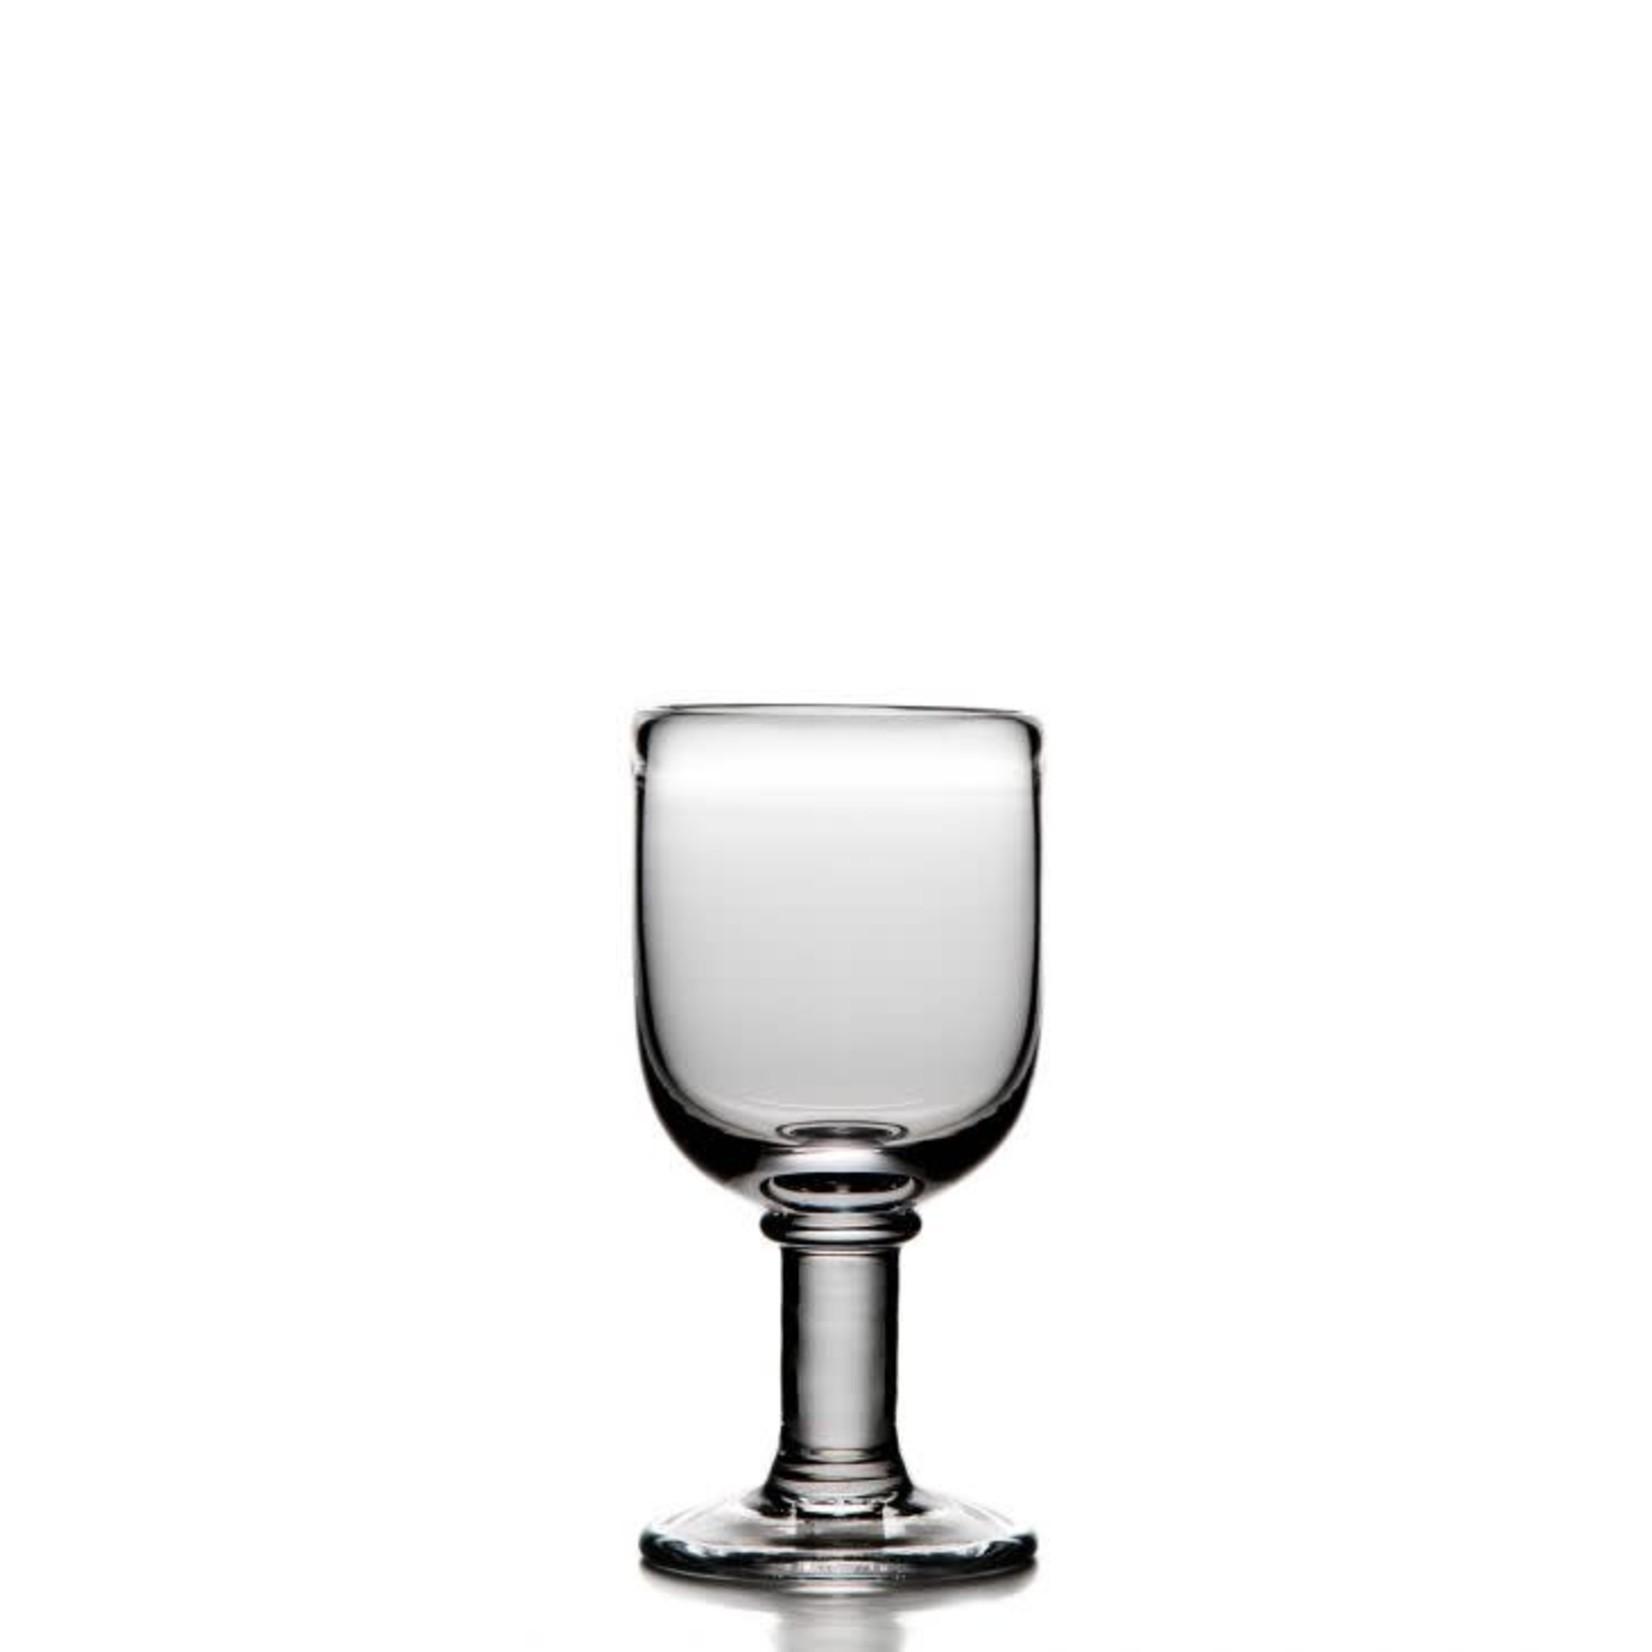 Essex Wine